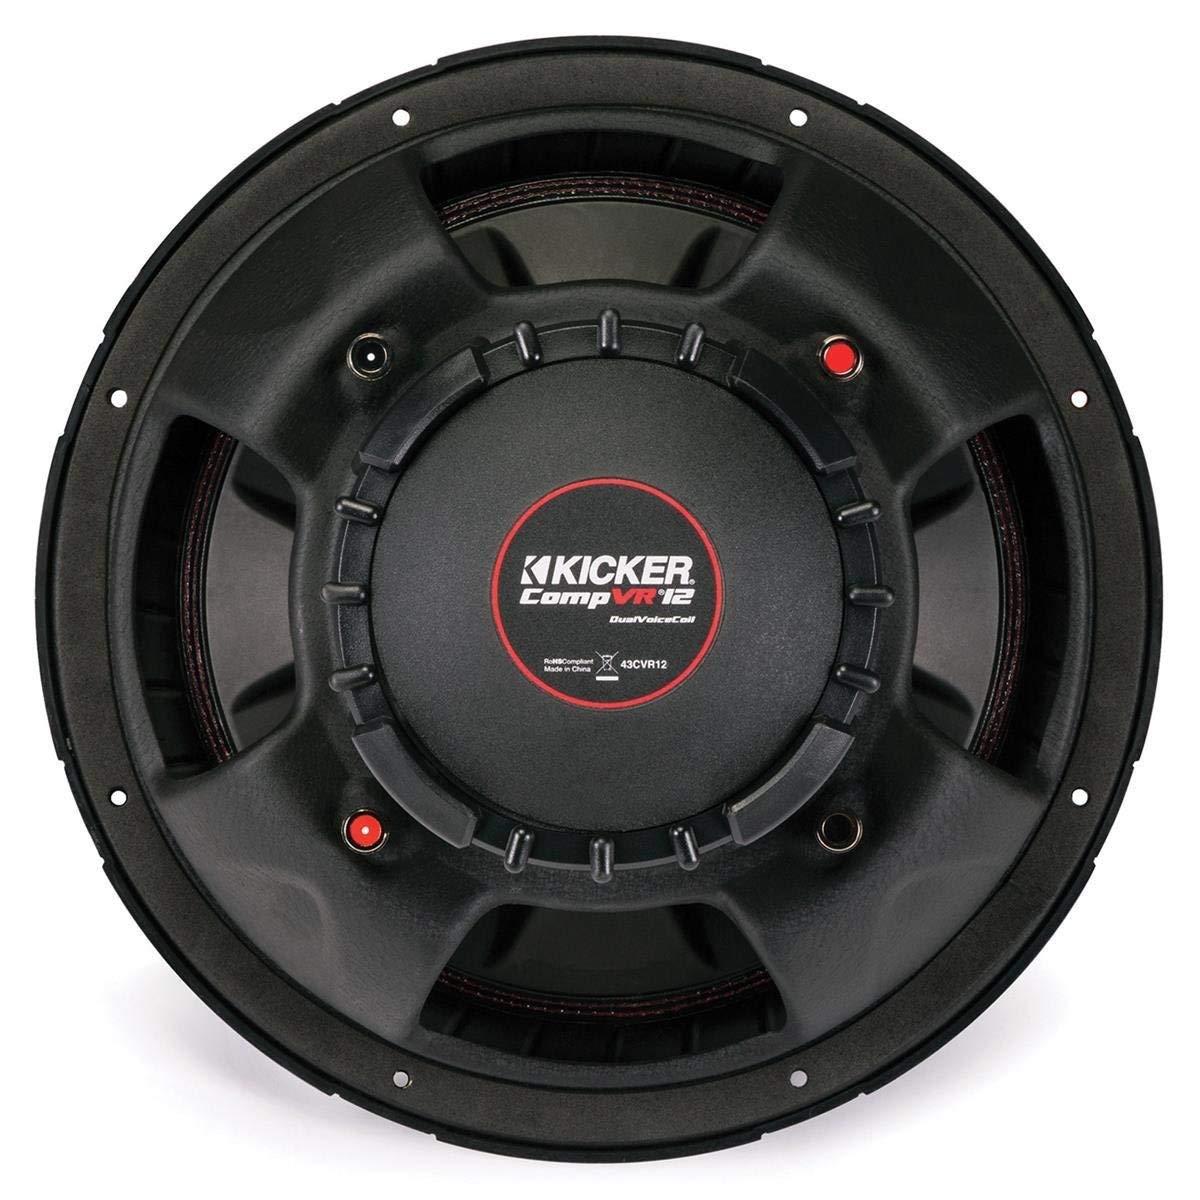 "Amazon.com: Kicker CompVR CVR122 (43CVR122) 800W Peak (400W RMS) 12"" CompVR  Series Dual 2-Ohm Car Subwoofer: Home Audio & Theater"